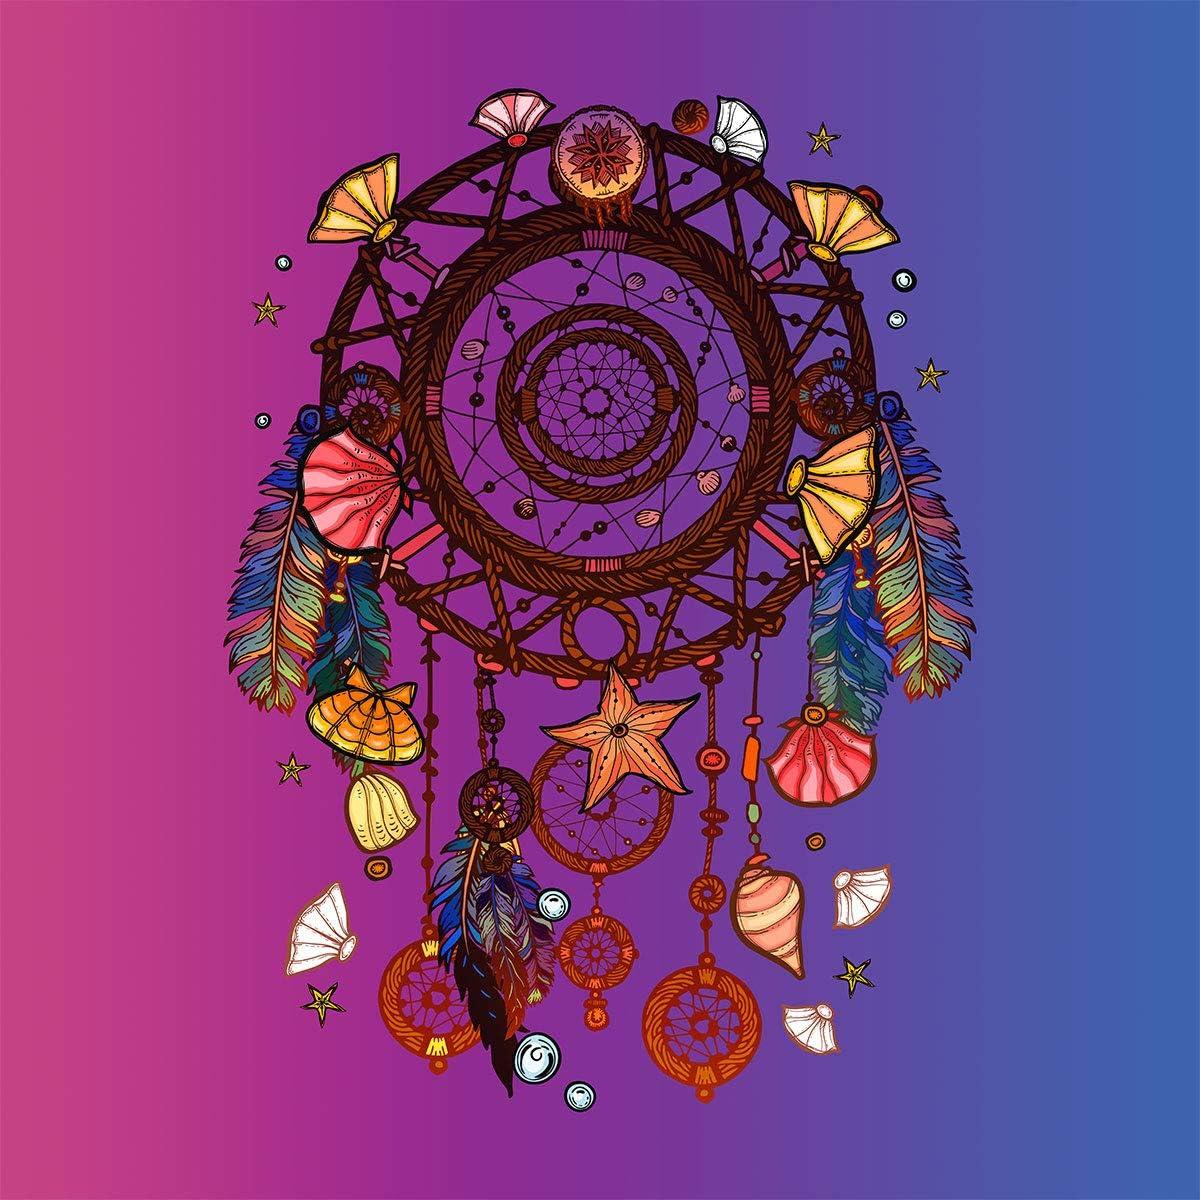 Erosebridal Bohemian Comforter Set Twin Size Dream Catcher Bedding Set Colorful Feather and Floral Printed on Black Duvet Cover Set,Starry Sky Theme Soft Microfiber Quilt Set for Girls Women